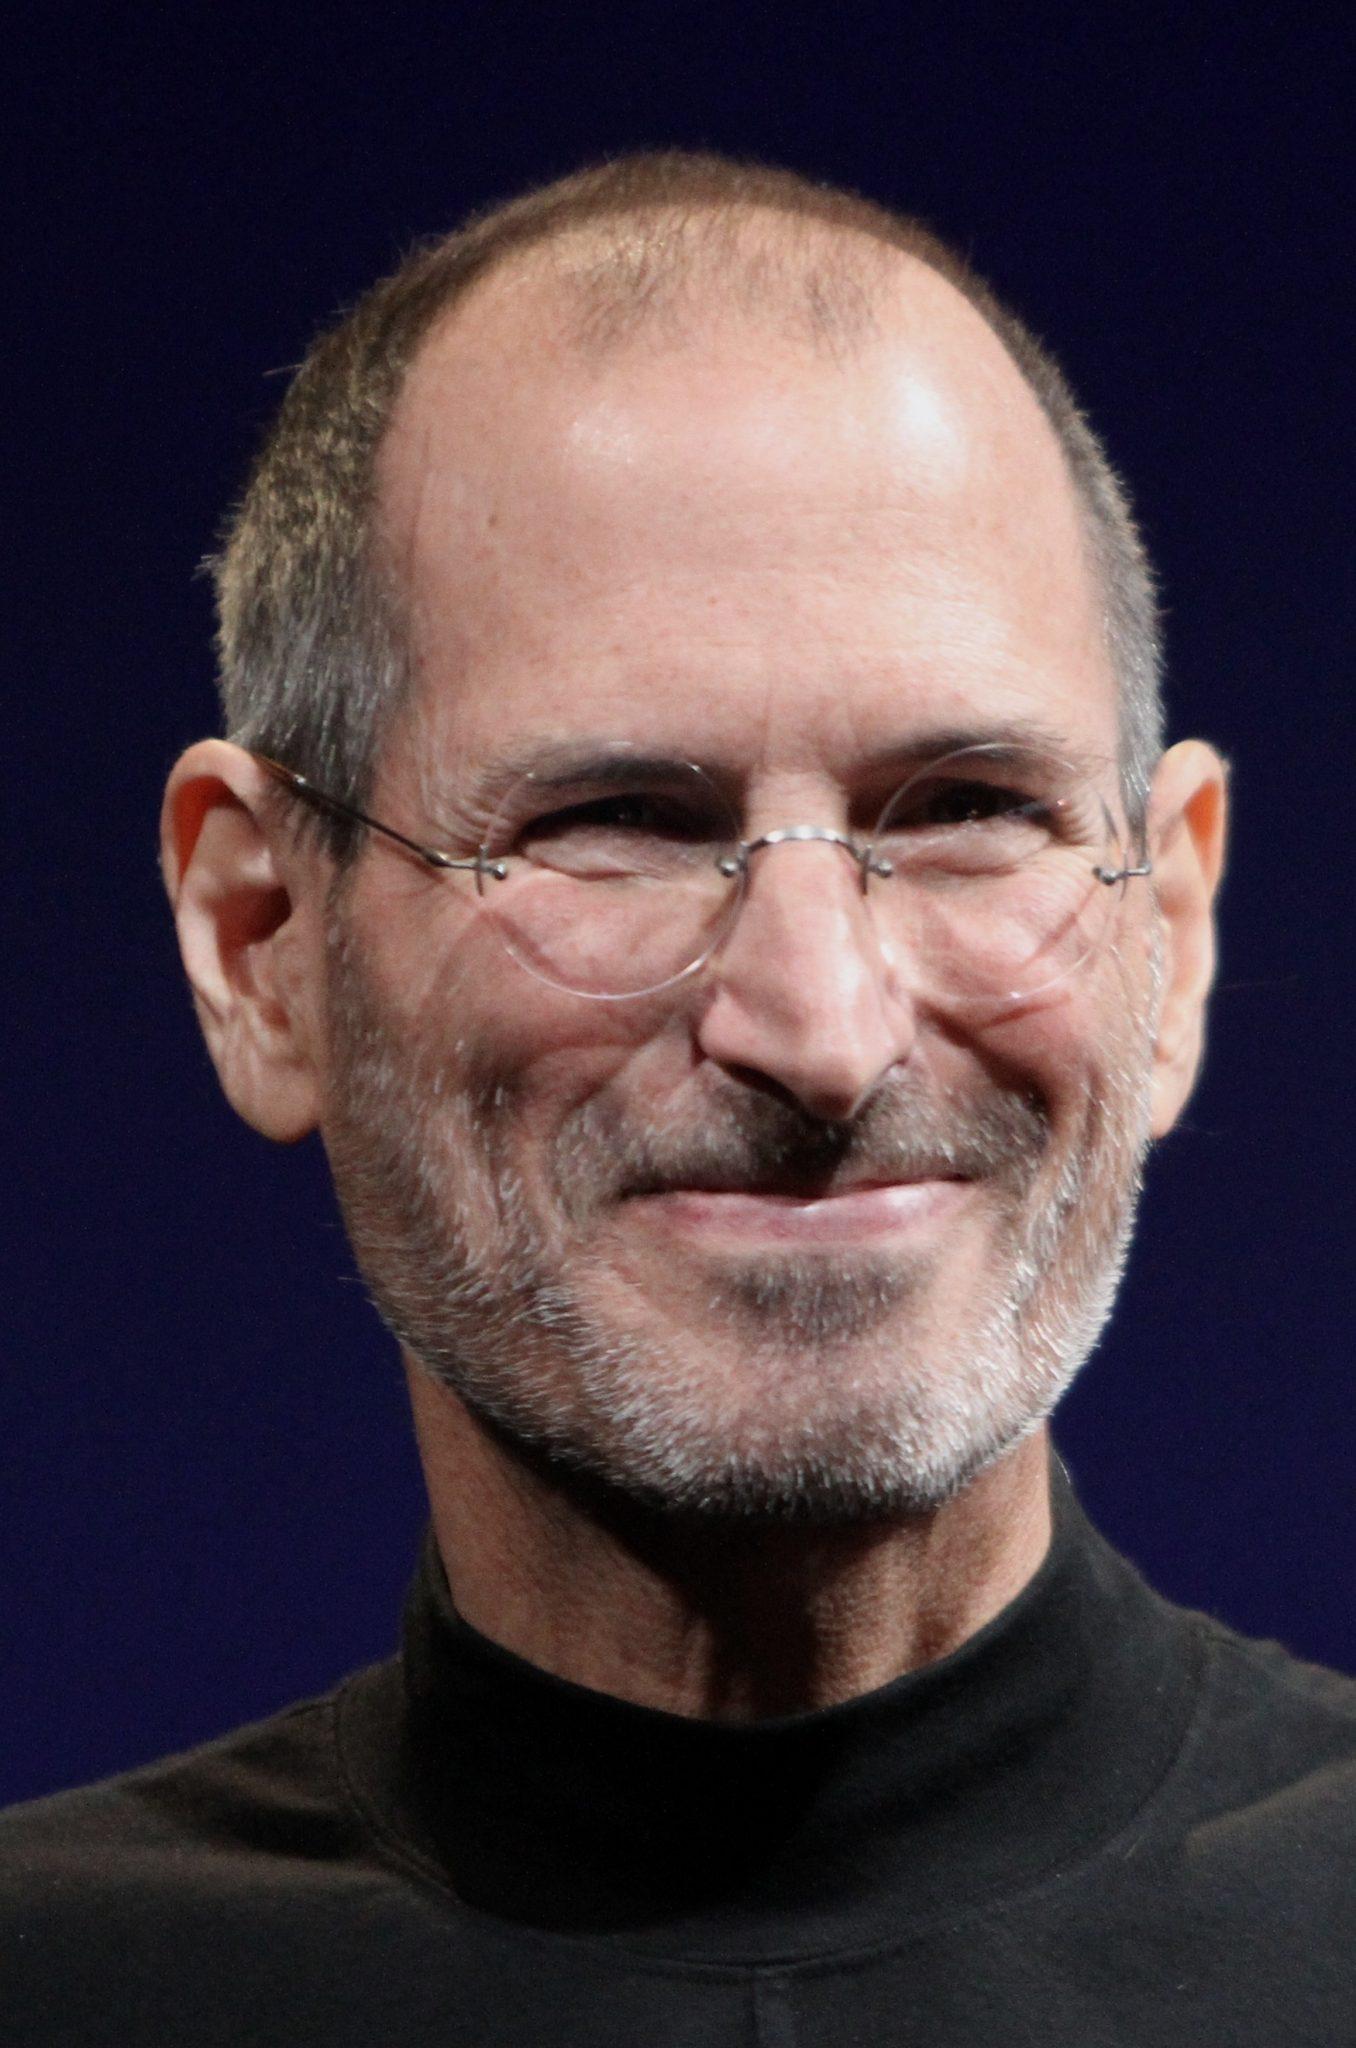 Steve Jobs, time, small probate estate, small estate, probate process, Michigan probate lawyer